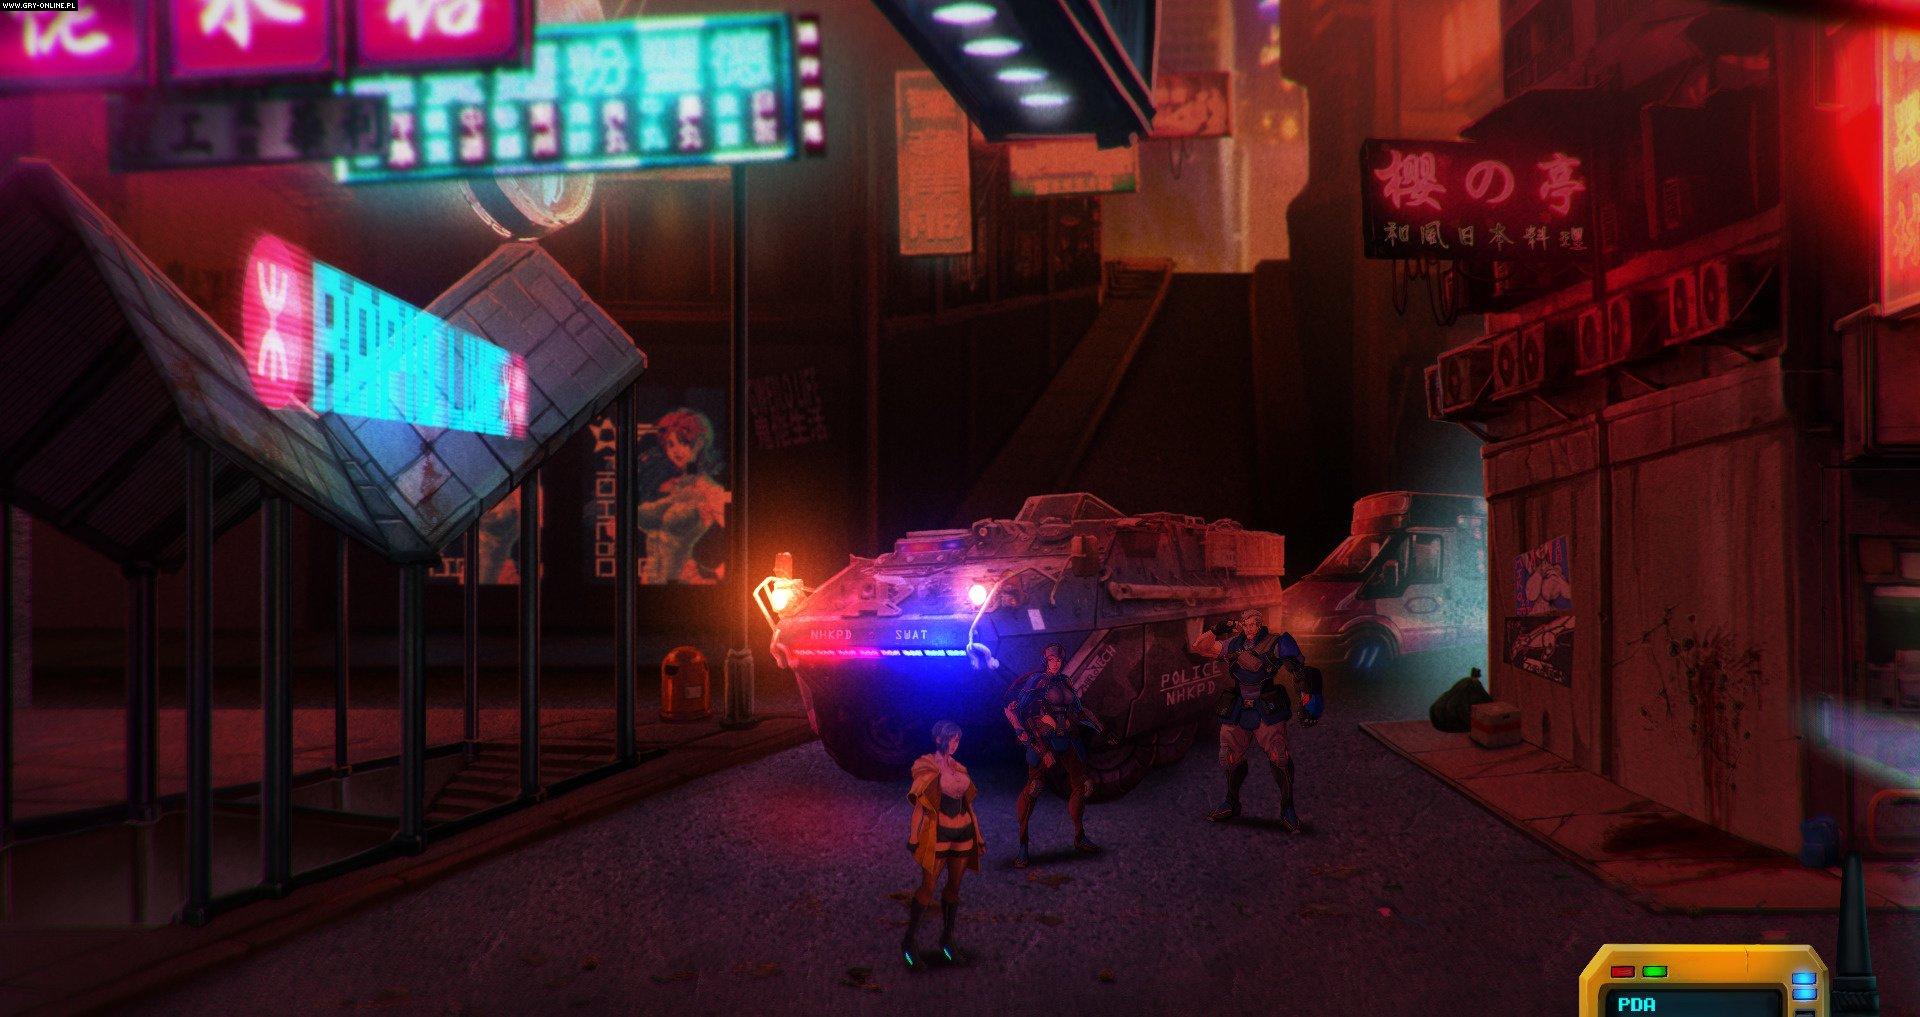 Sense: A Cyberpunk Ghost Story Nintendo Switch gameplay